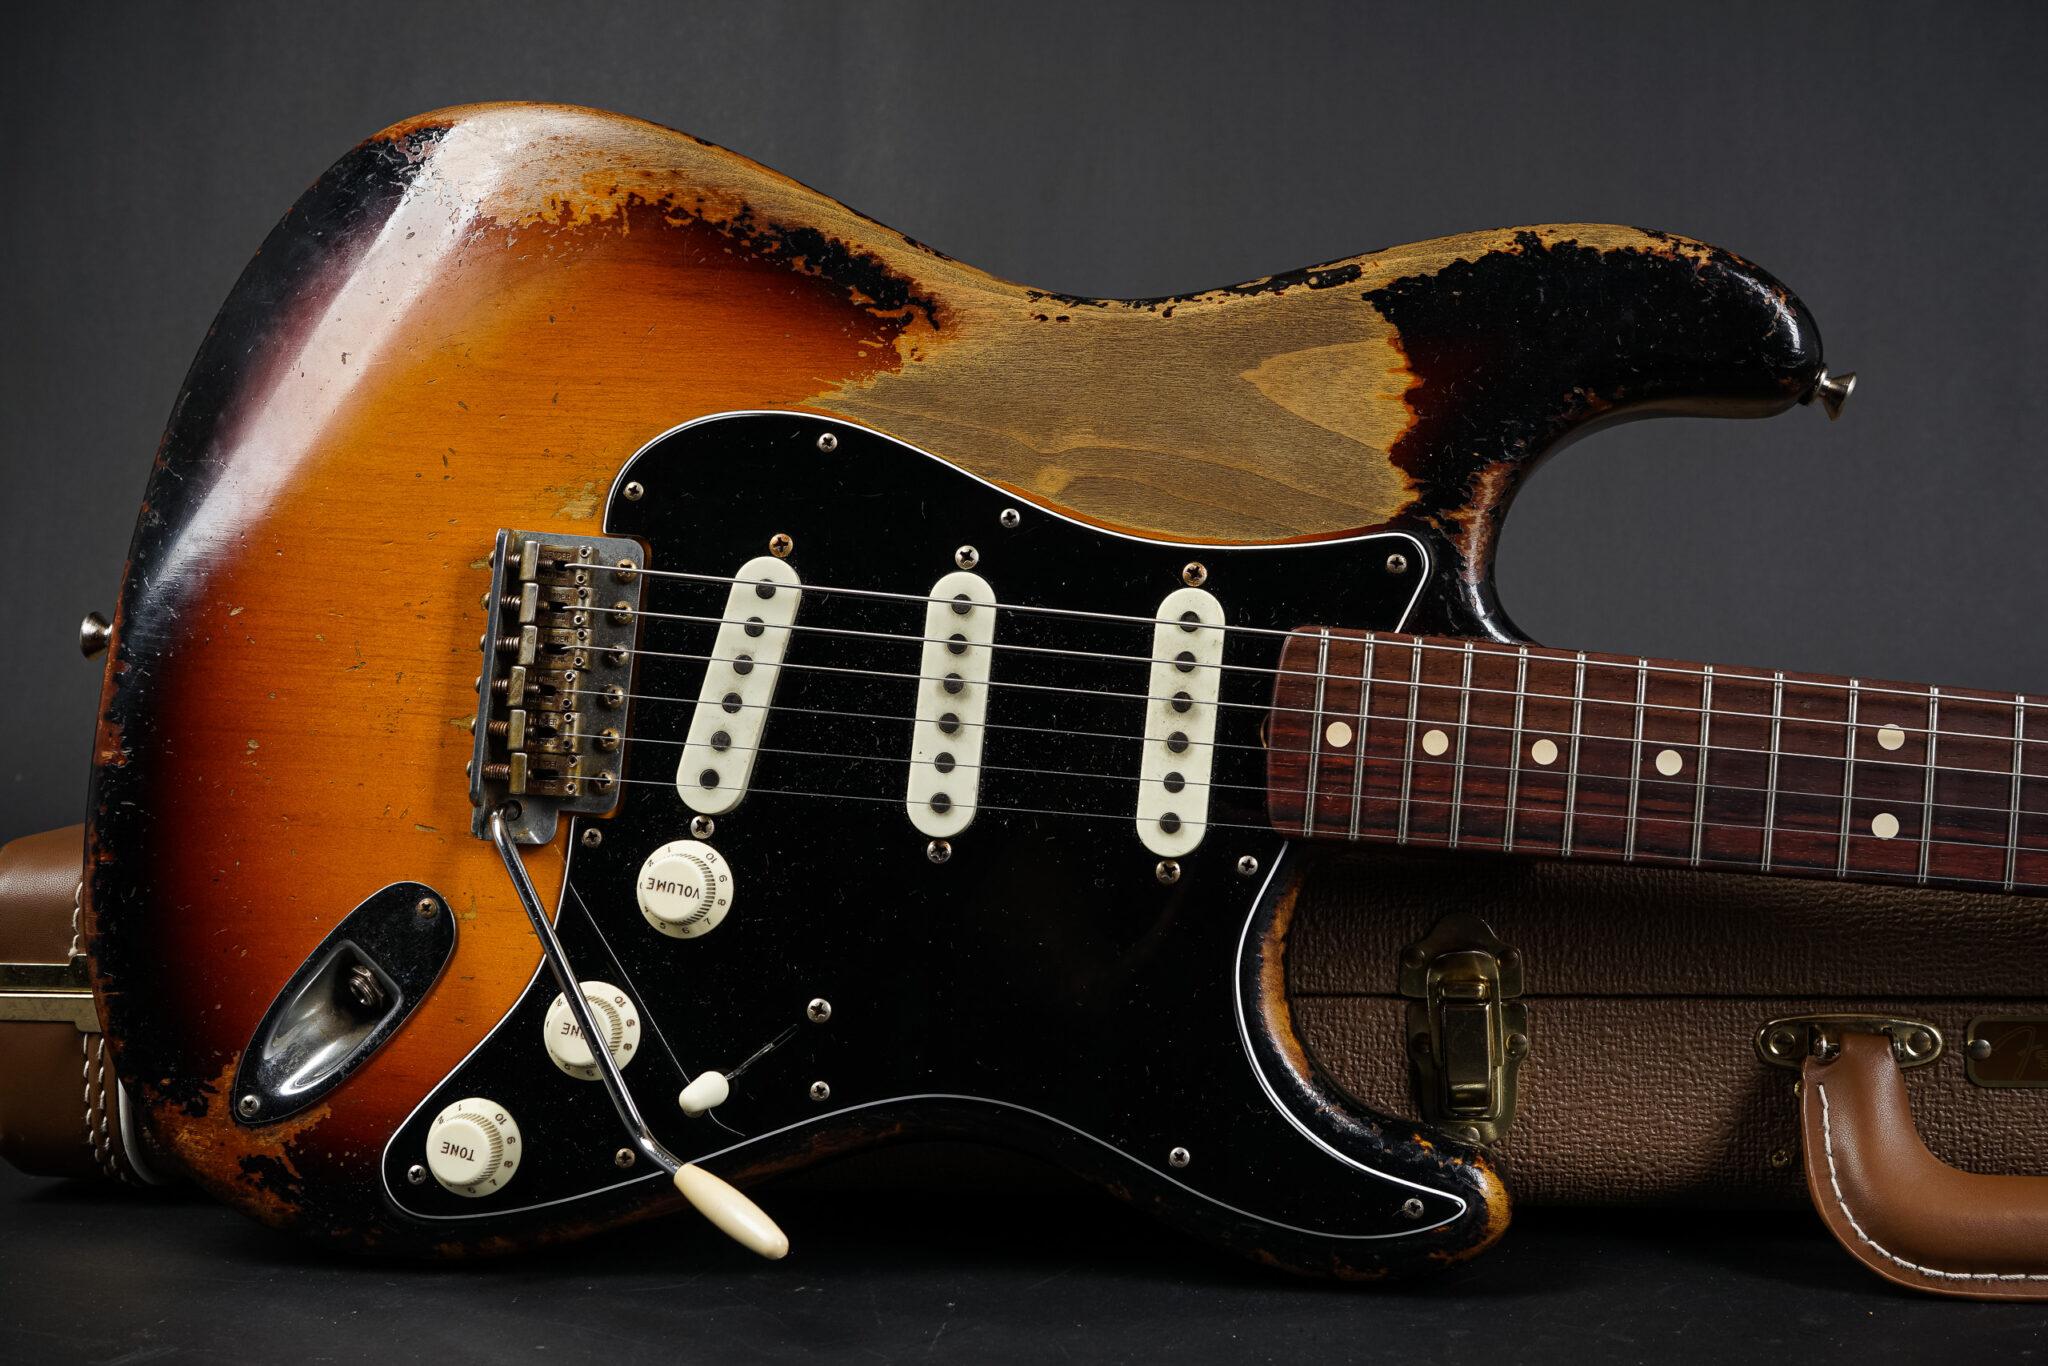 https://guitarpoint.de/app/uploads/products/2020-fender-dale-wilson-masterbuilt-1963-stratocaster-heavy-relic-sunburst/2020-Fender-Dale-Wilson-Masterbuilt-1963-Stratocaster-CZ547644-9-2048x1366.jpg